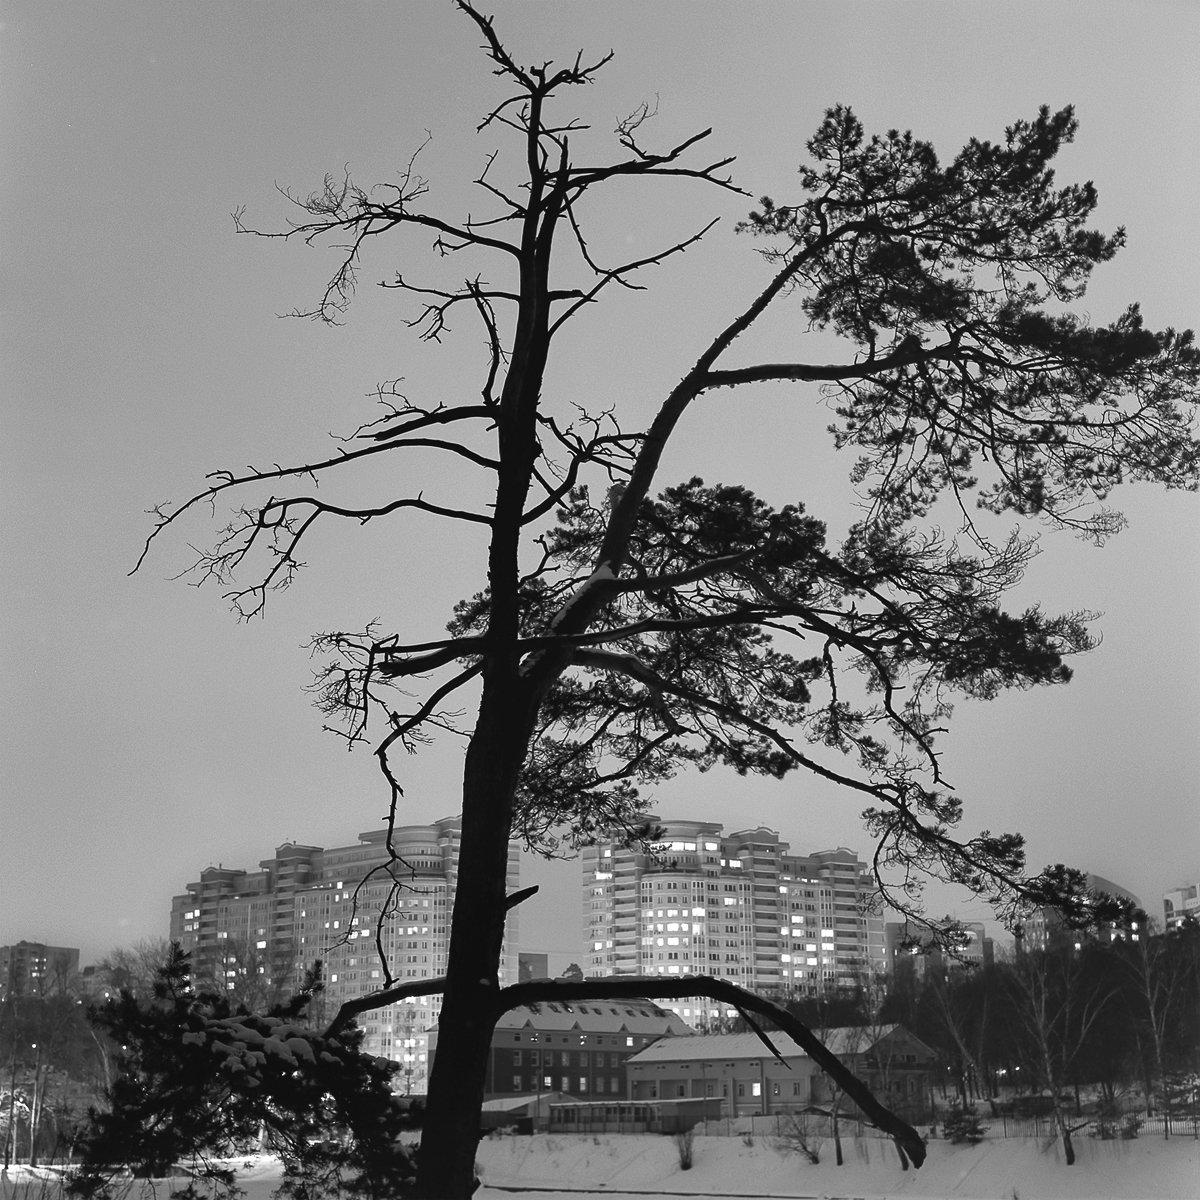 ночной пейзаж., снег., Александр Резников